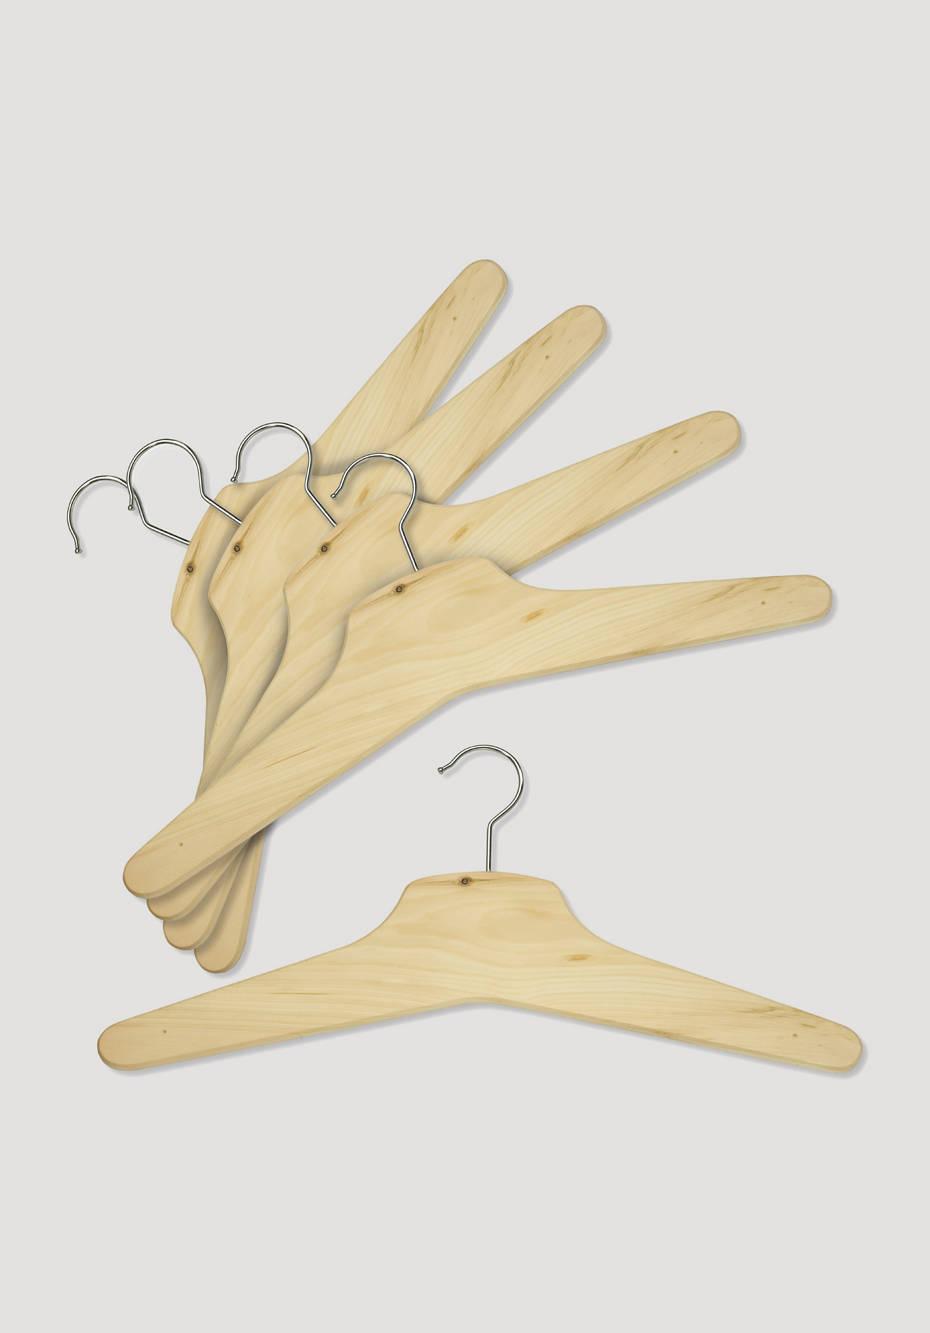 Pine clothes hangers